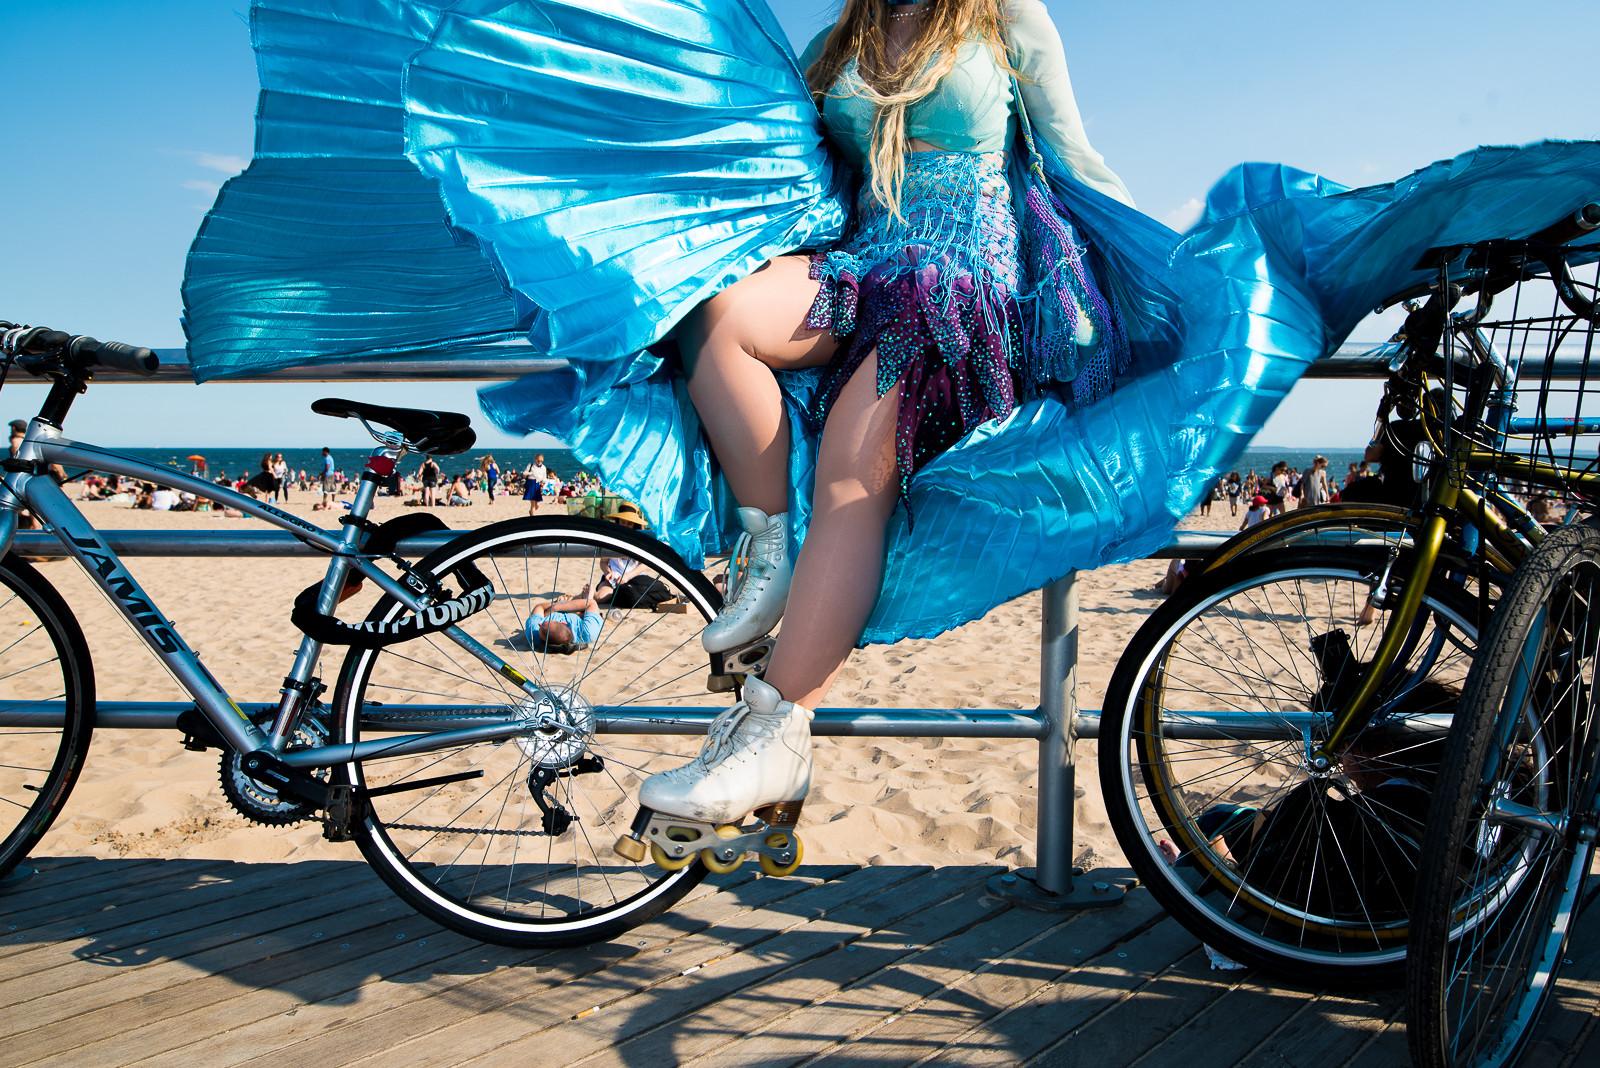 2016-06-17 Coney Island Mermaid -106.jpg